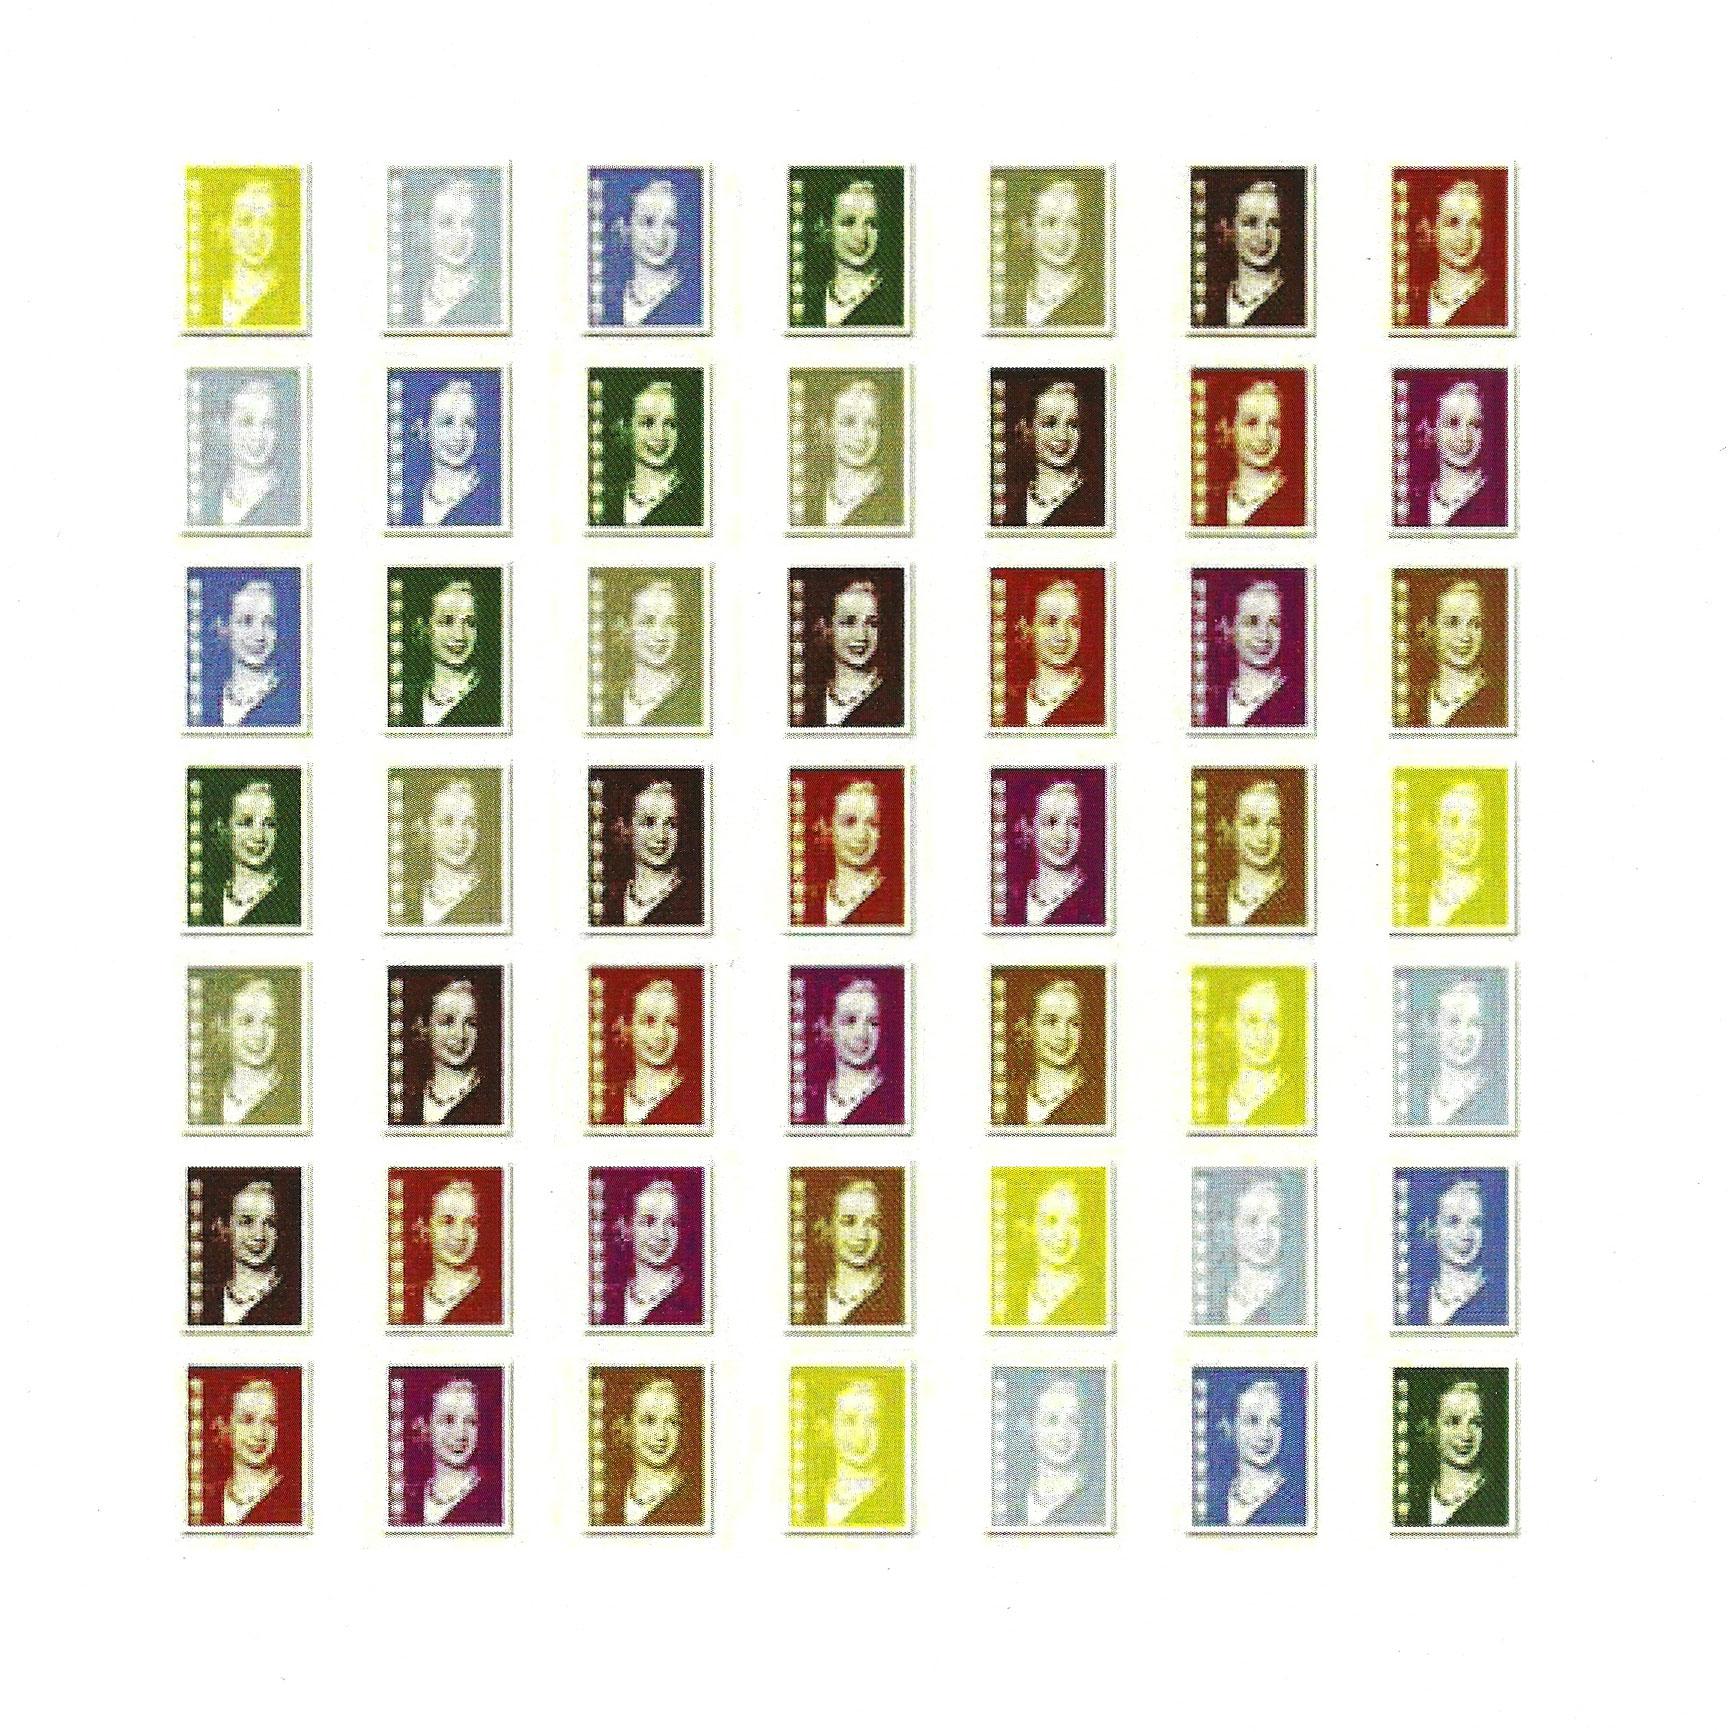 Evita, Serie, Serigrafía, 2012